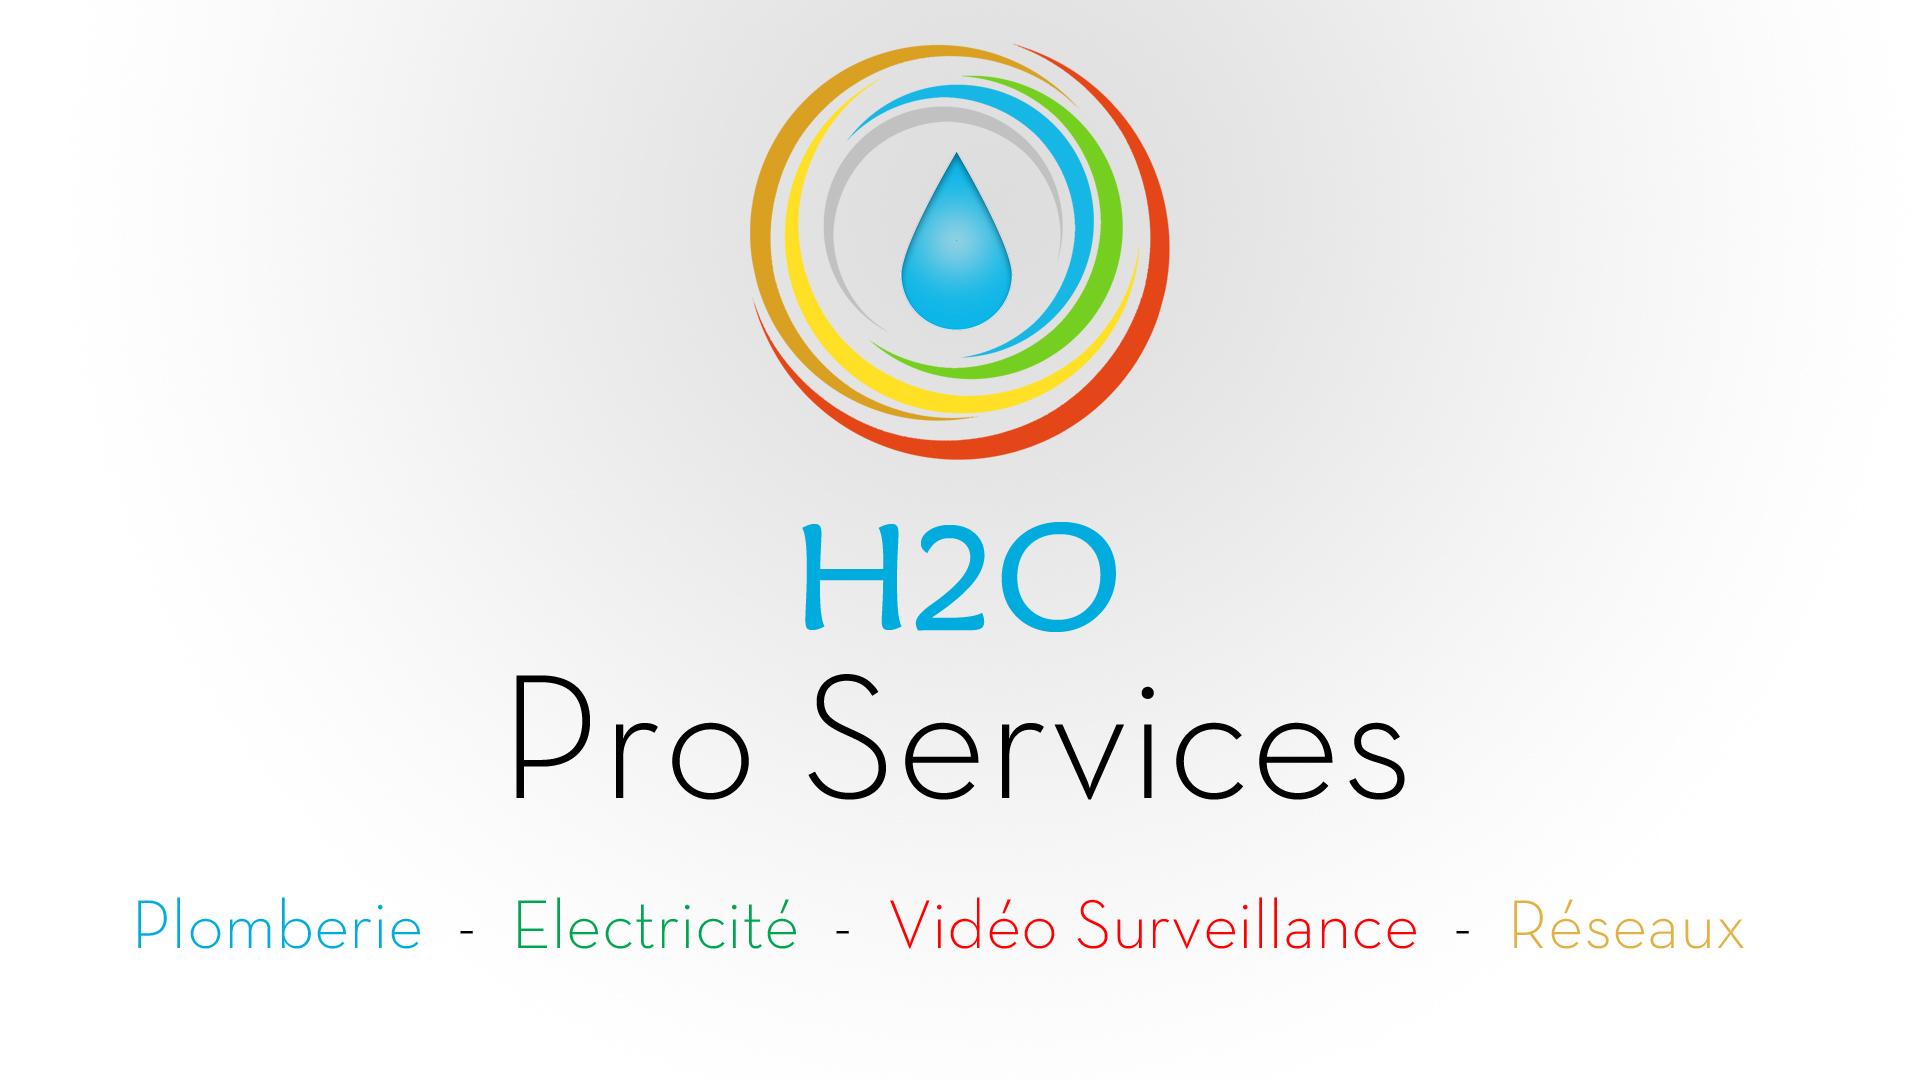 H2o Pro-Services